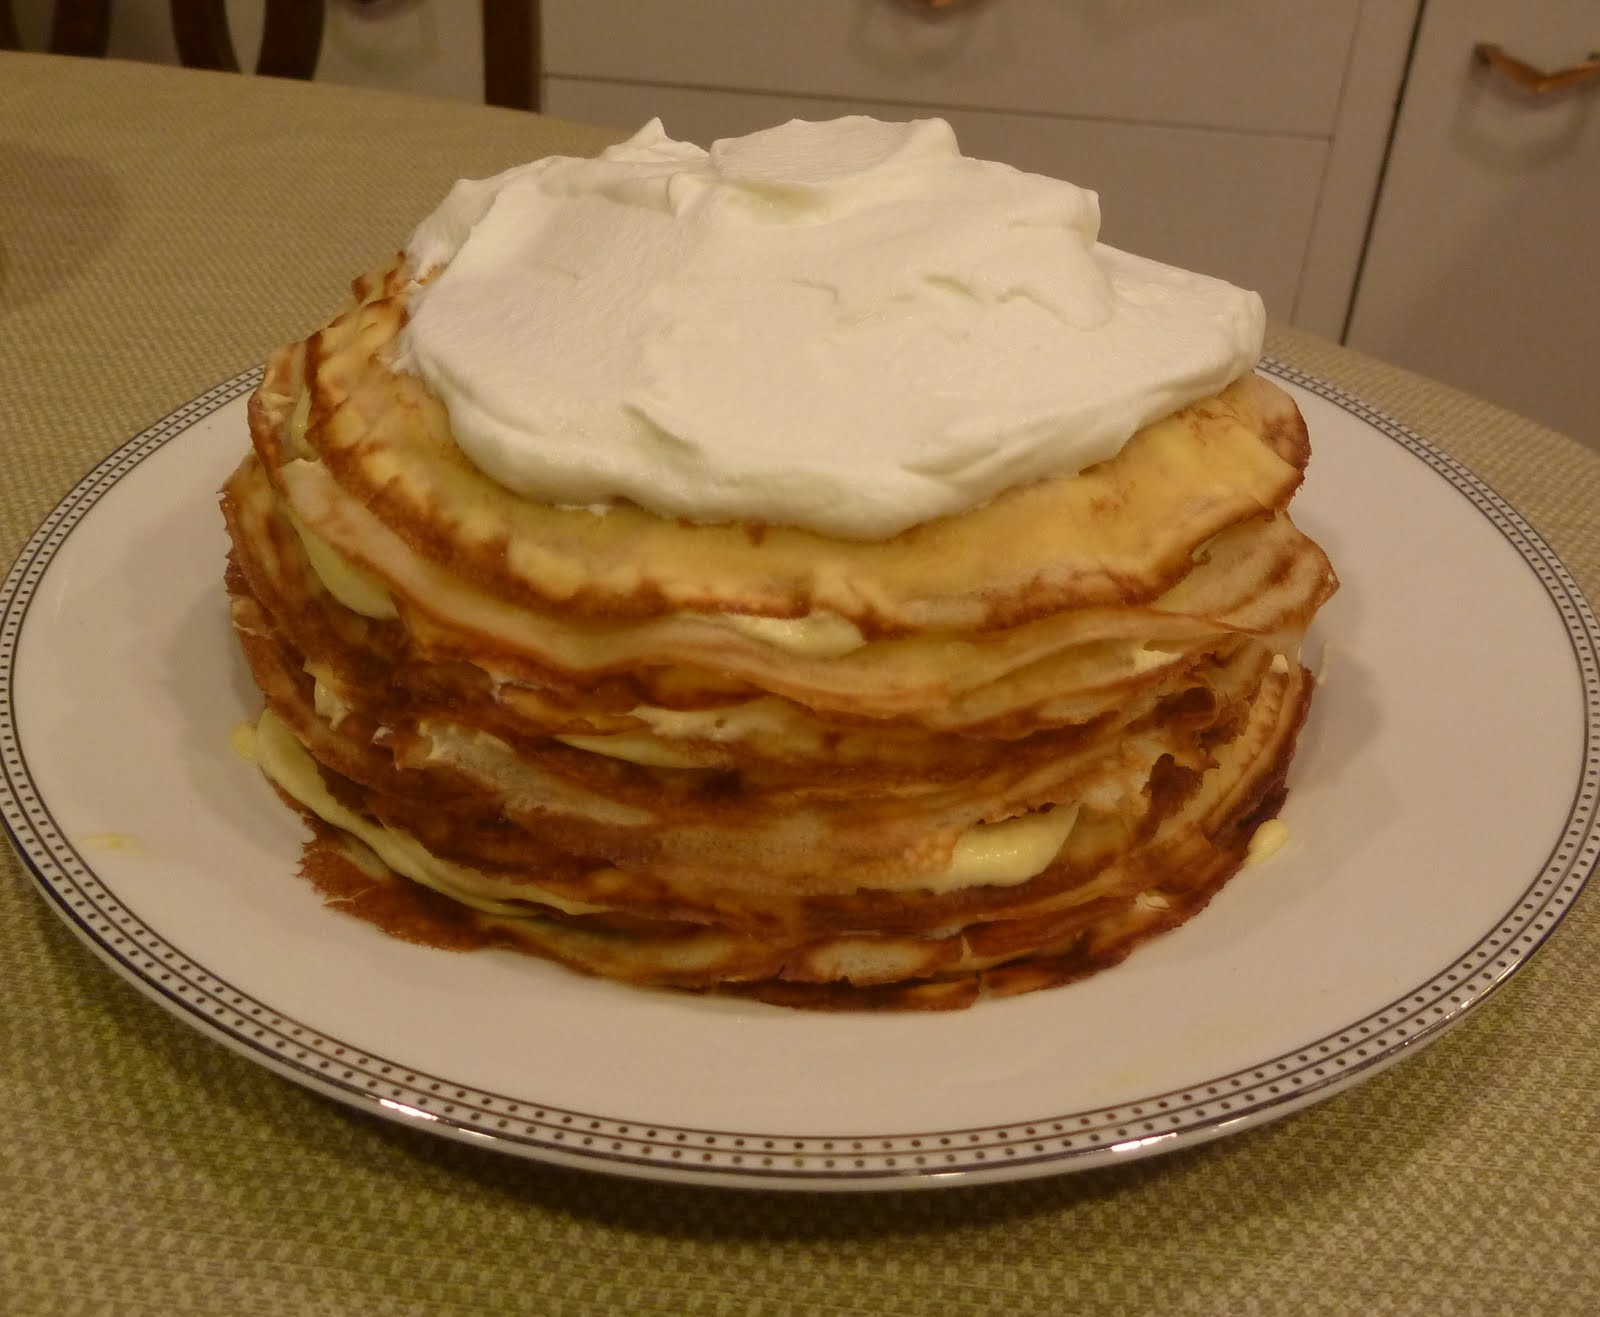 Mandy's Baking Adventures: Meyer Lemon Crepe Cake